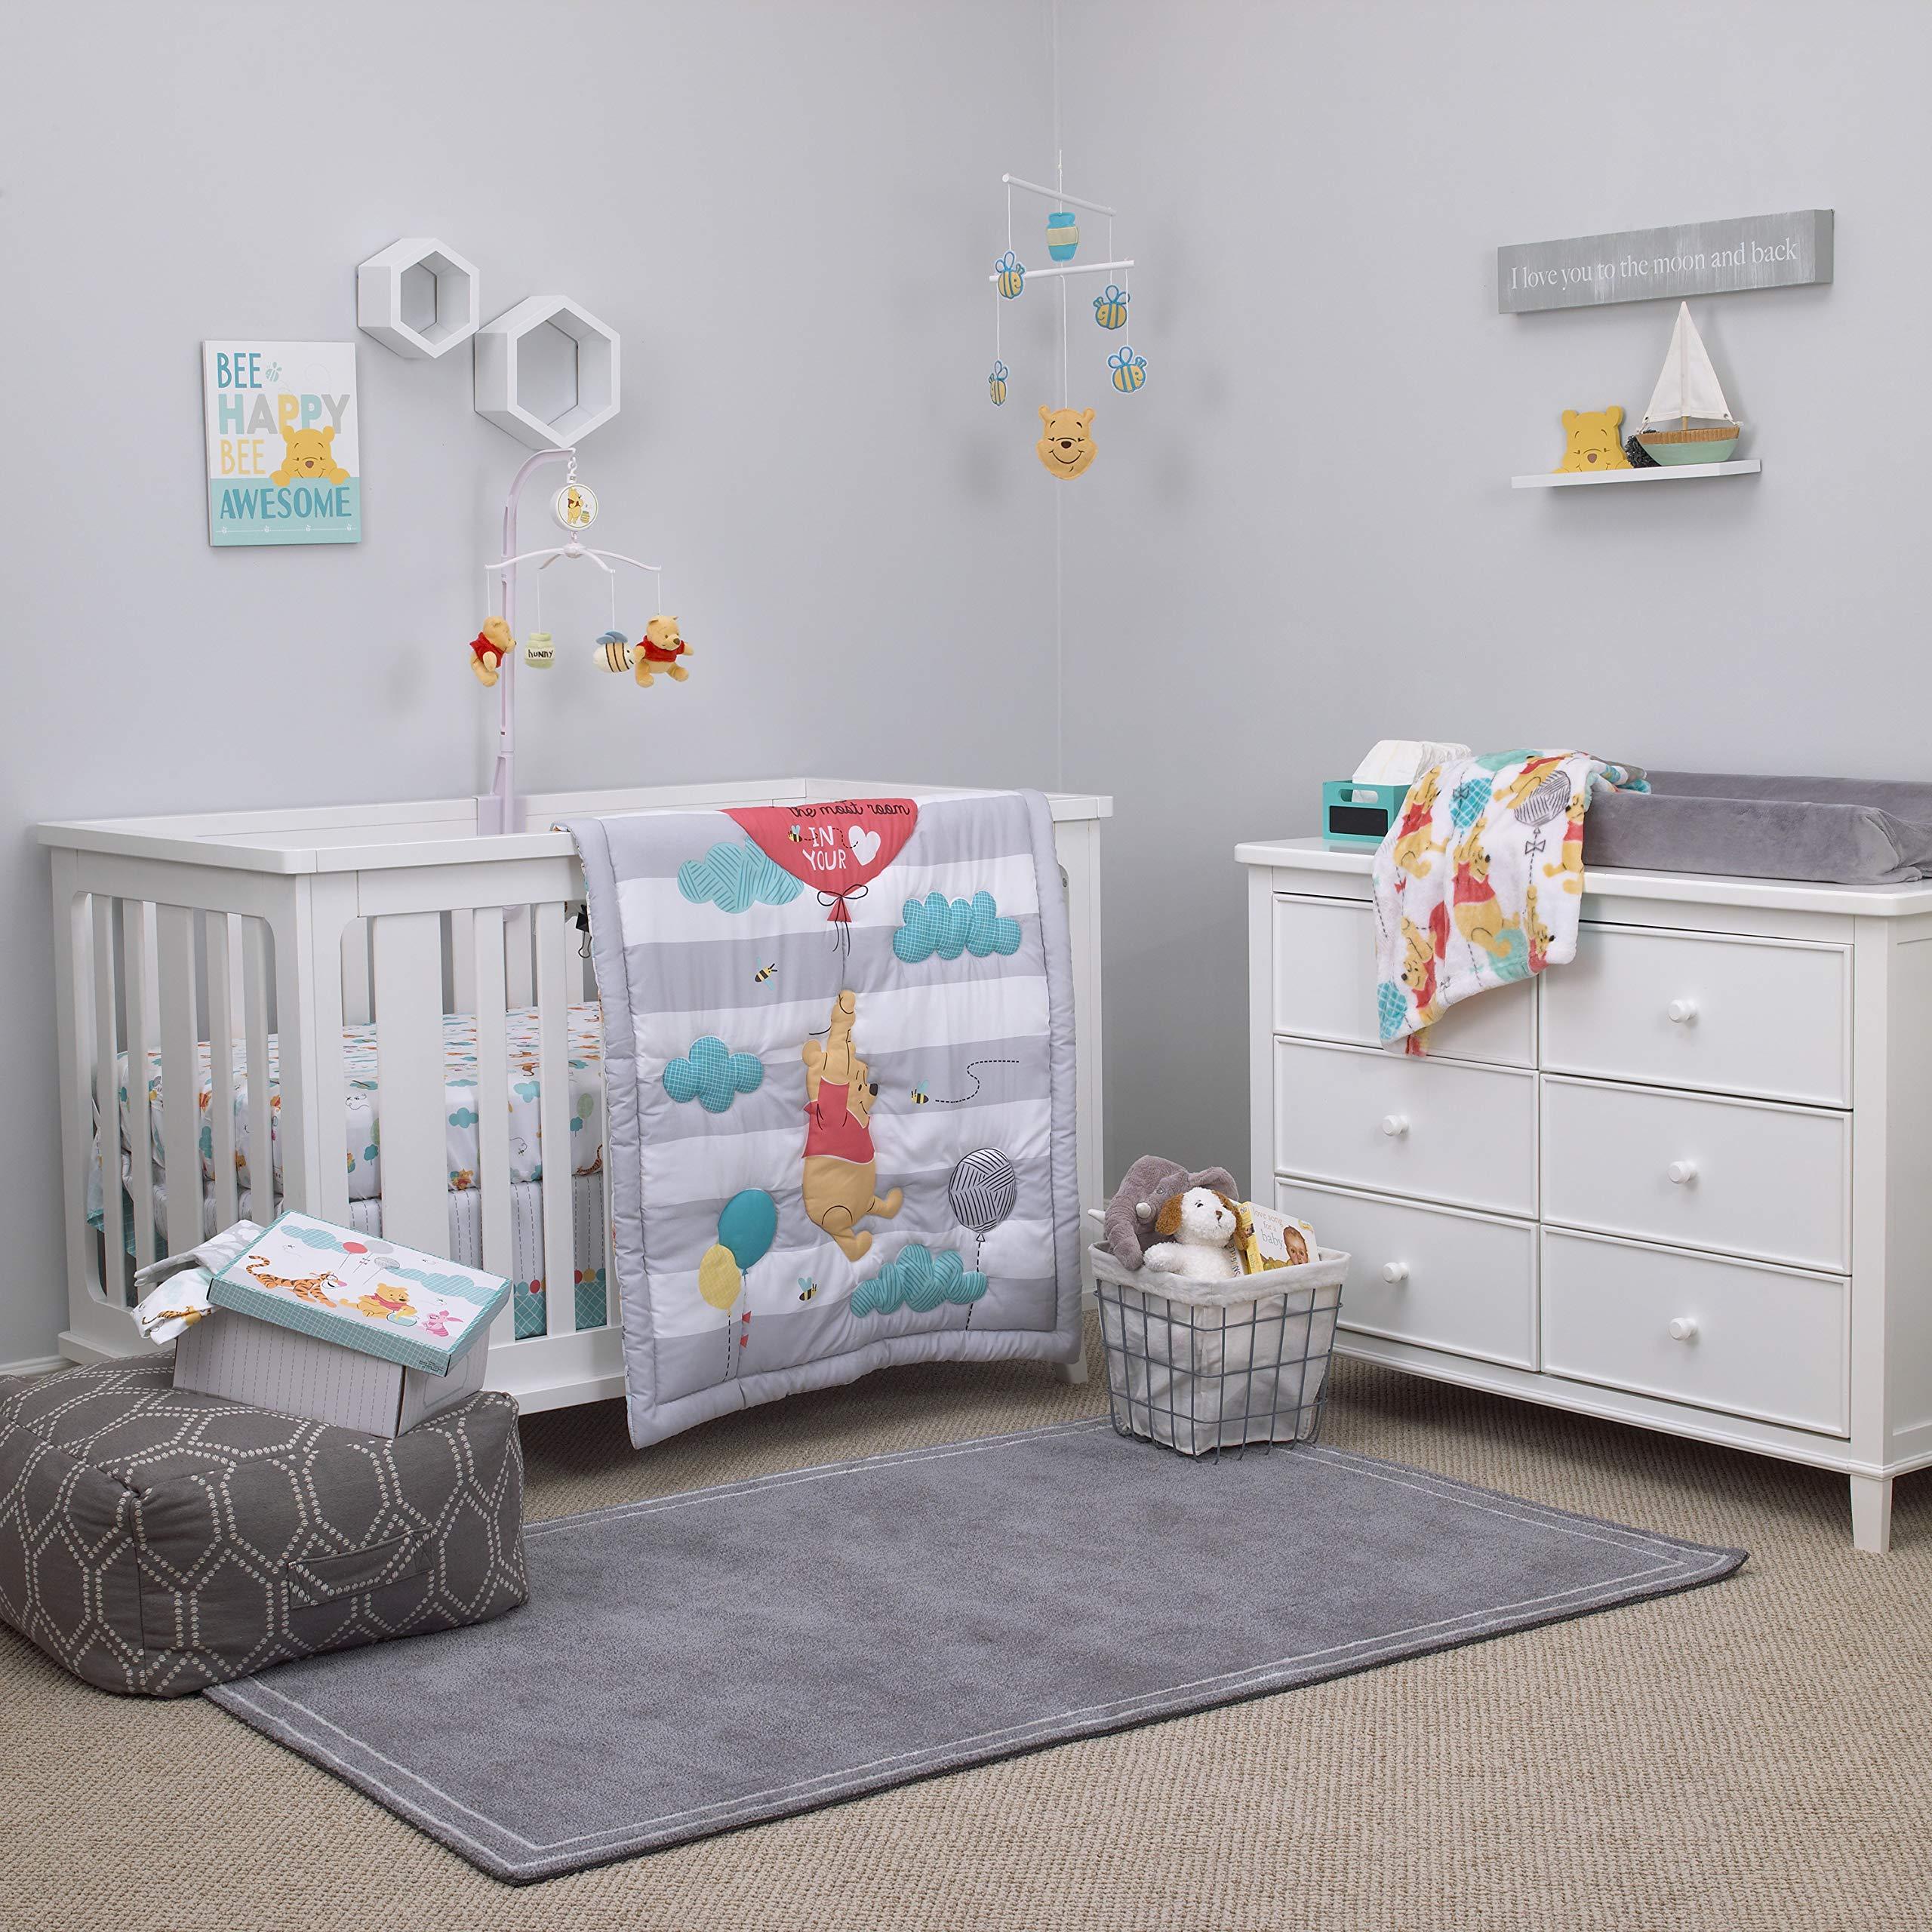 disney mobile winnie the pooh nursery. Black Bedroom Furniture Sets. Home Design Ideas